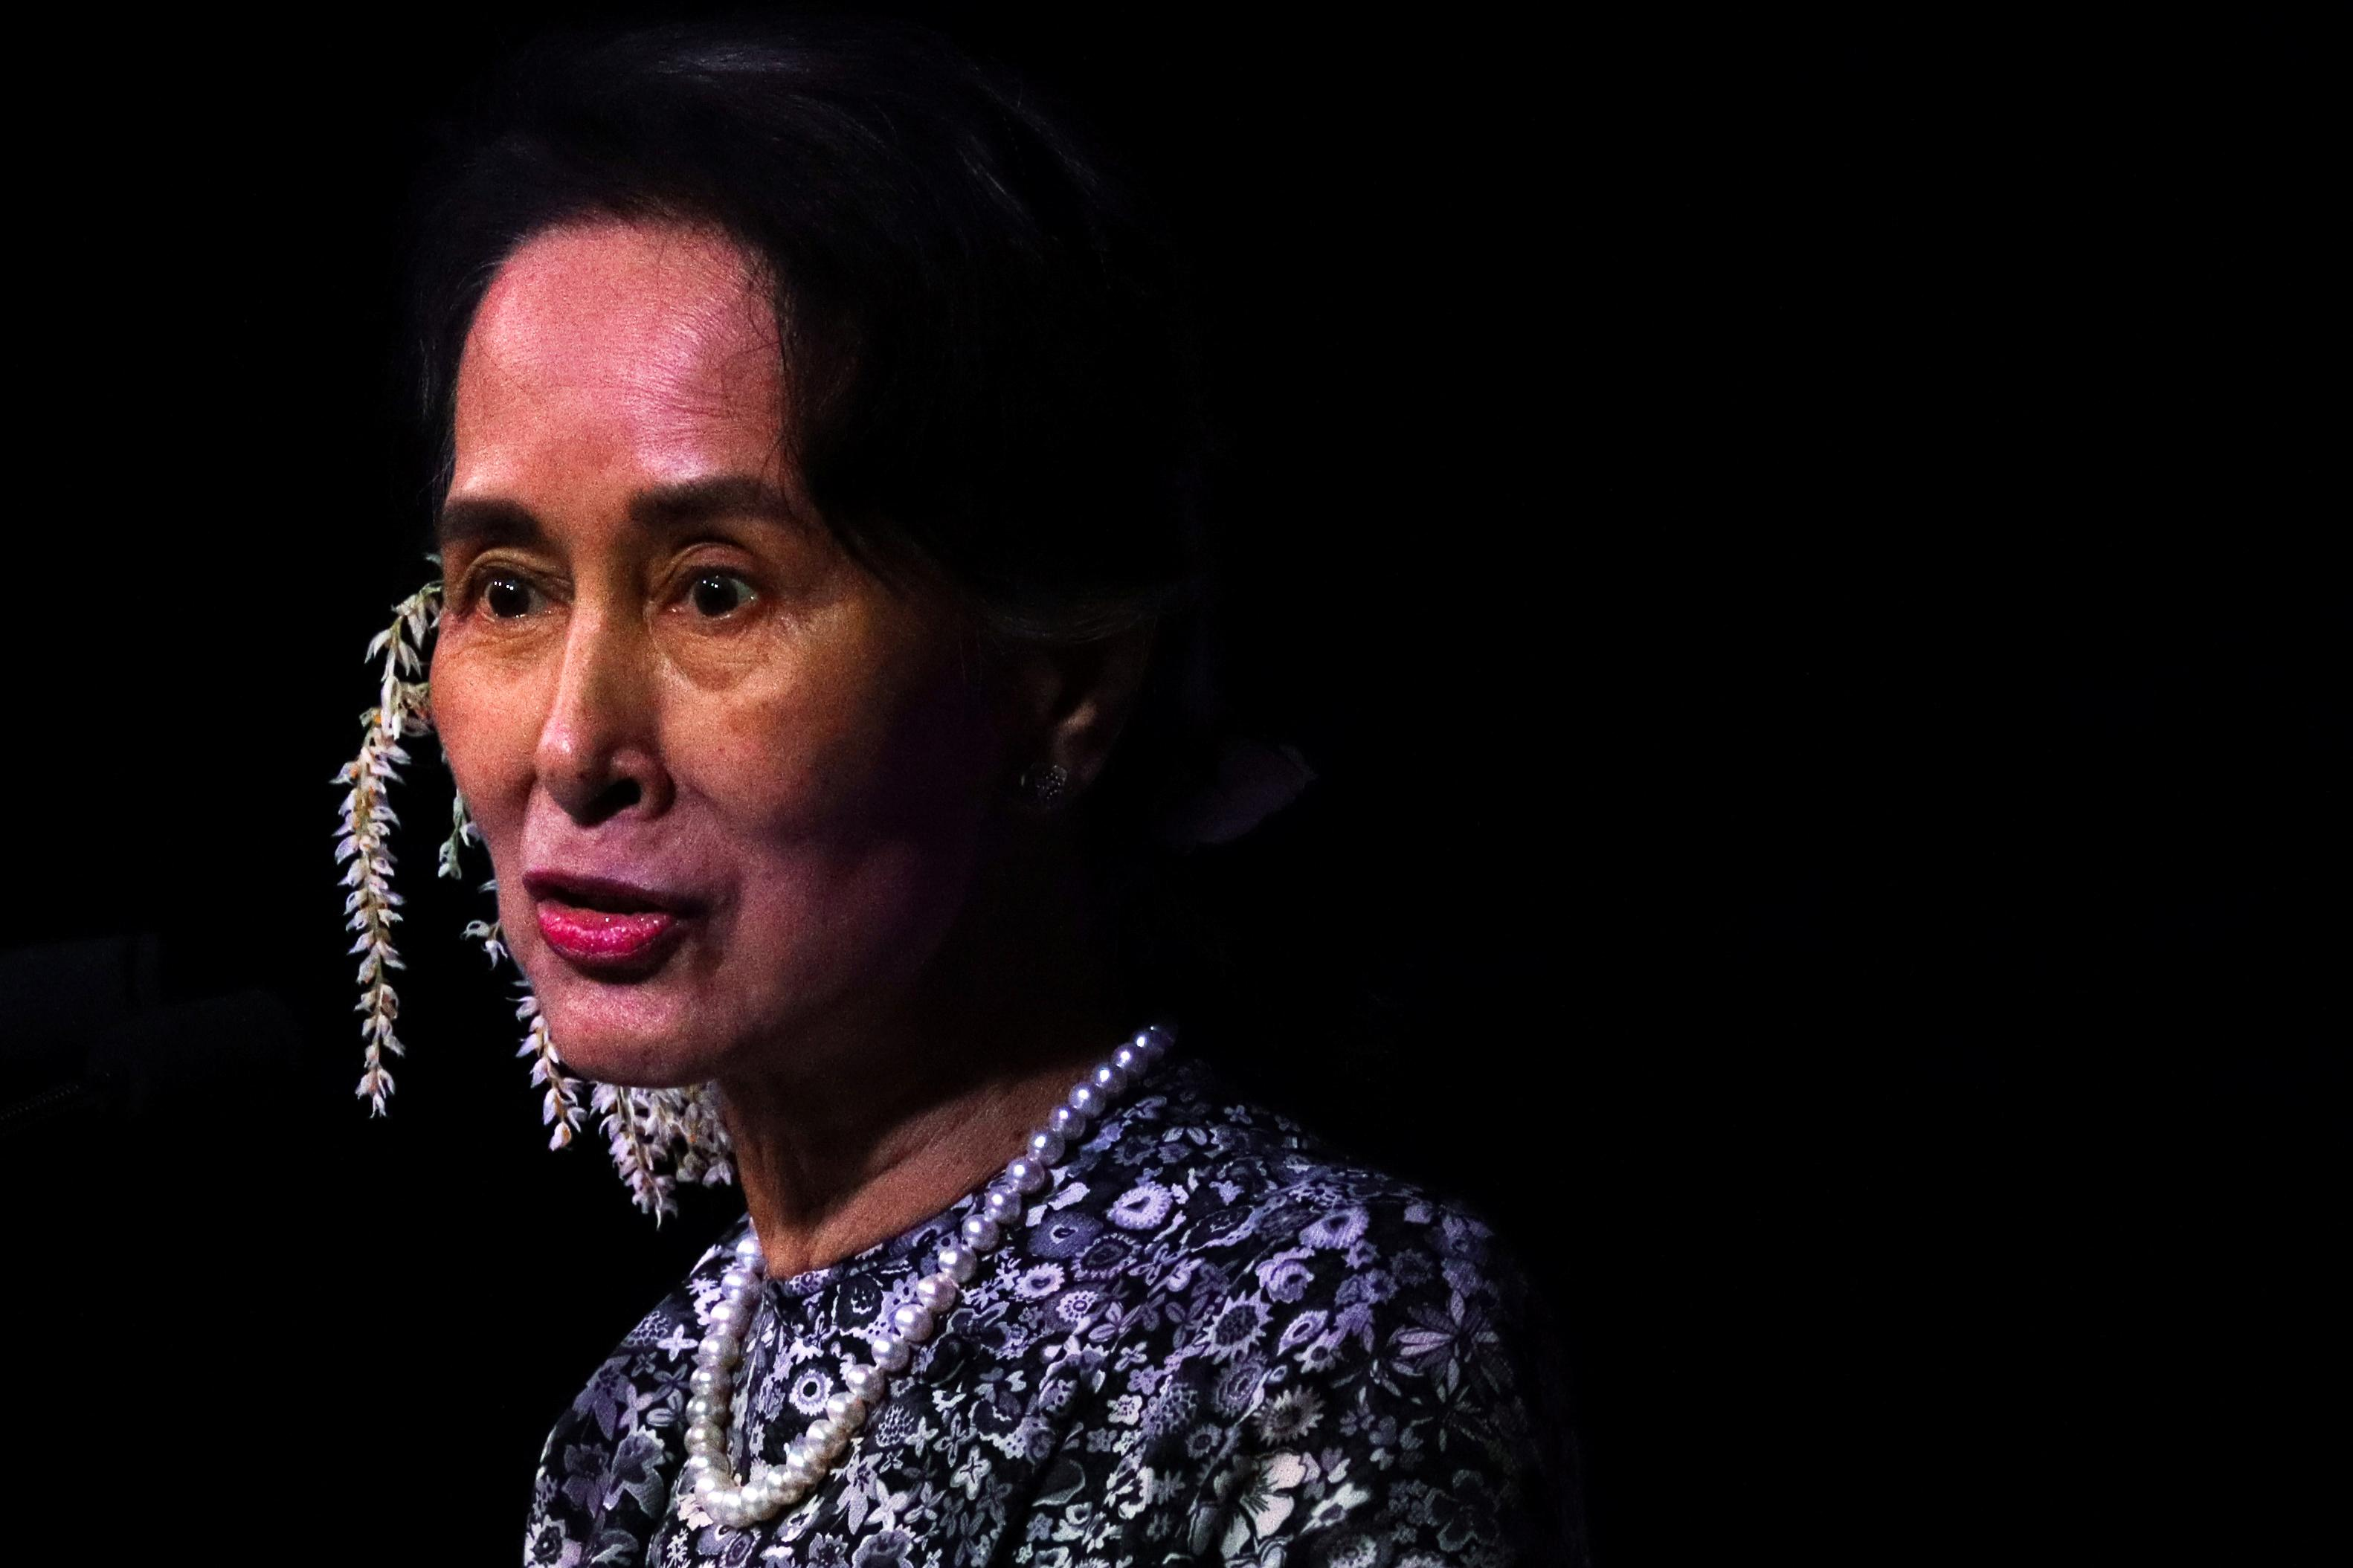 'Defending the indefensible': Malaysia's Mahathir slams Suu Kyi...